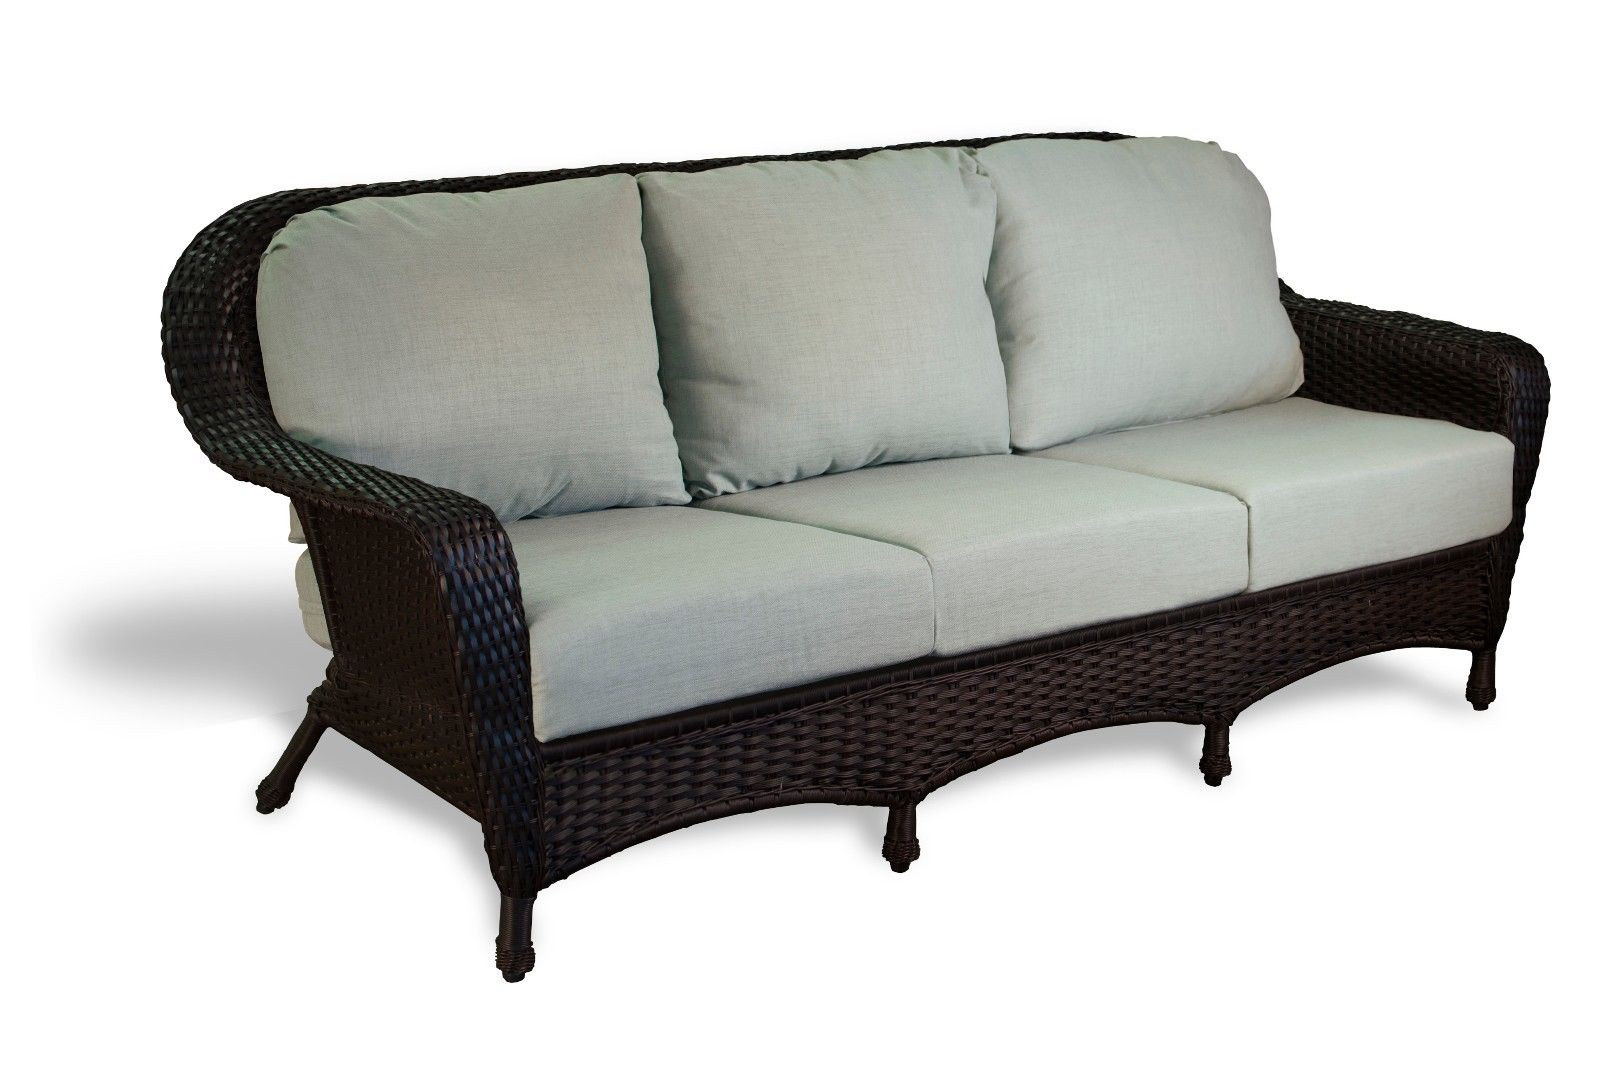 #52 - Outdoor Patio Garden Furniture Tortoise Resin Wicker Sofa -  Rave Spearmint Cushion